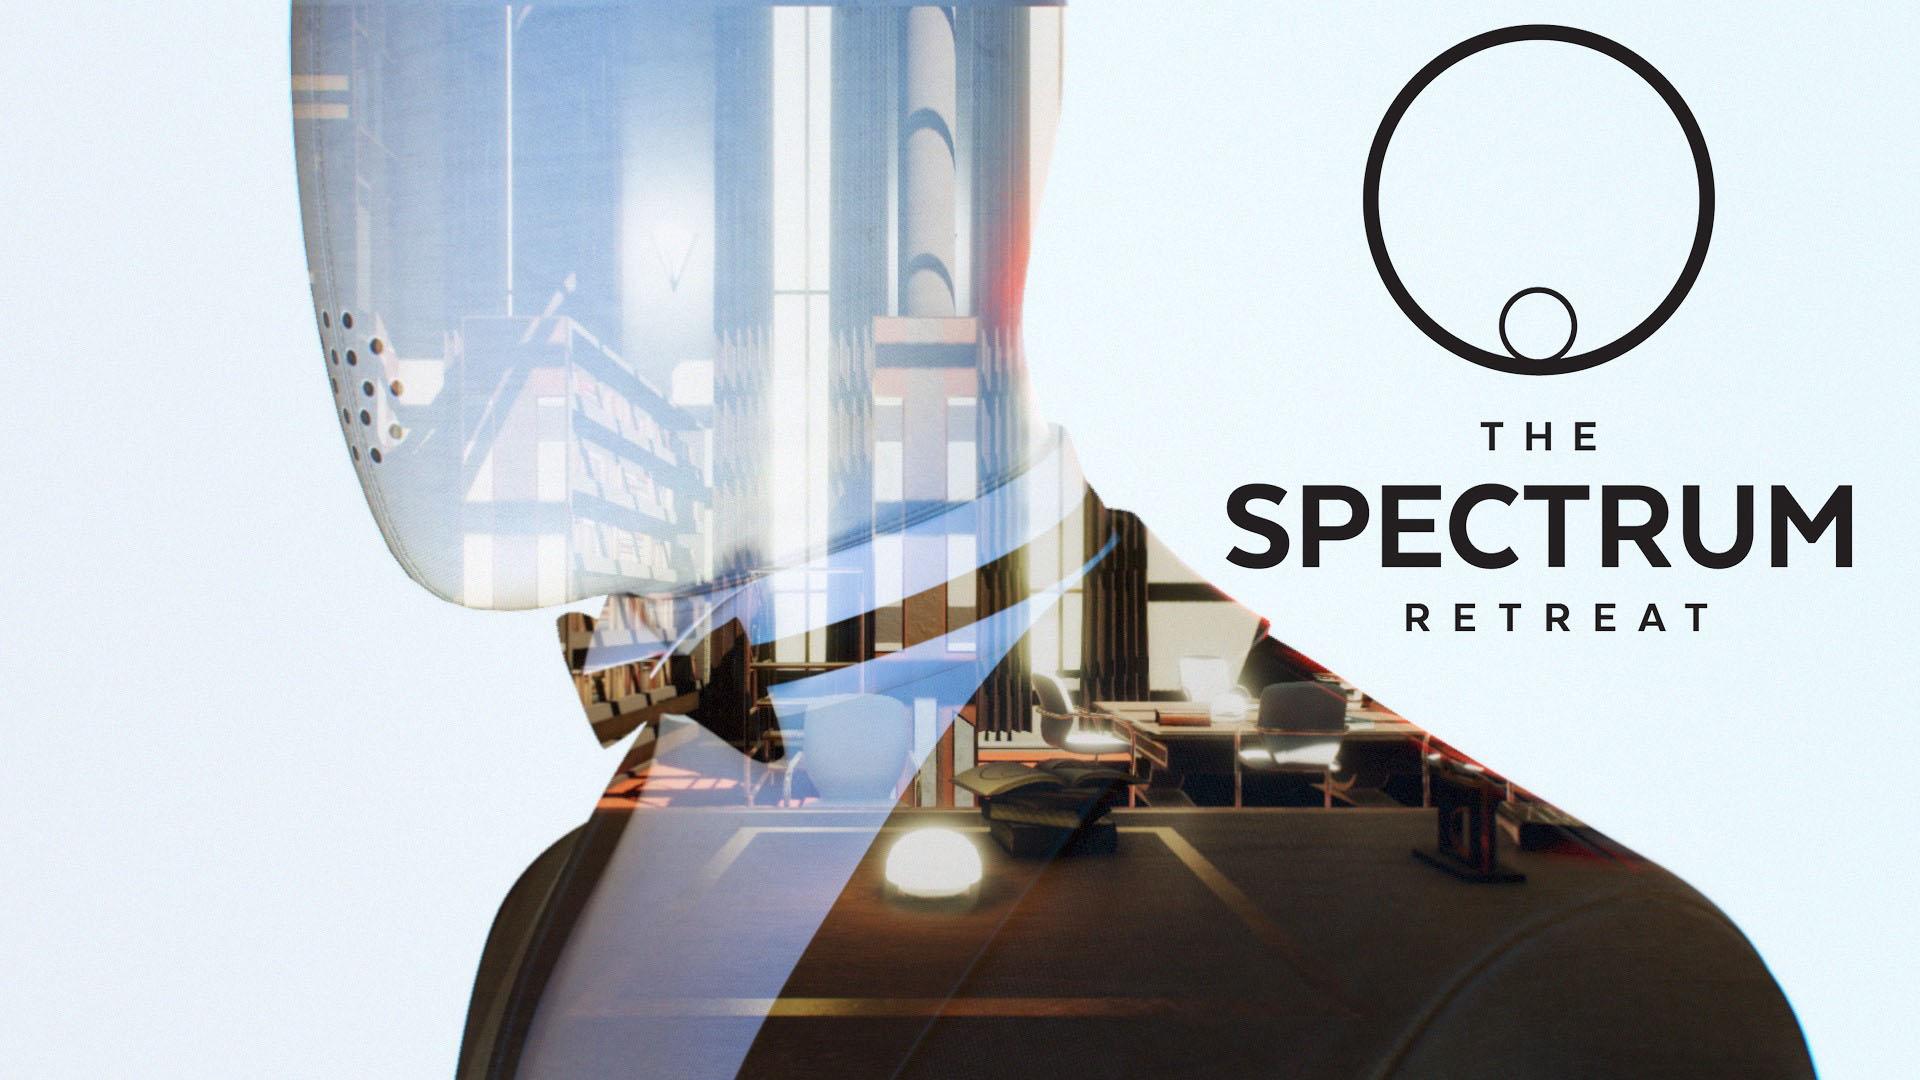 The Spectrum Retreat Türkçe Yama - Teknotower